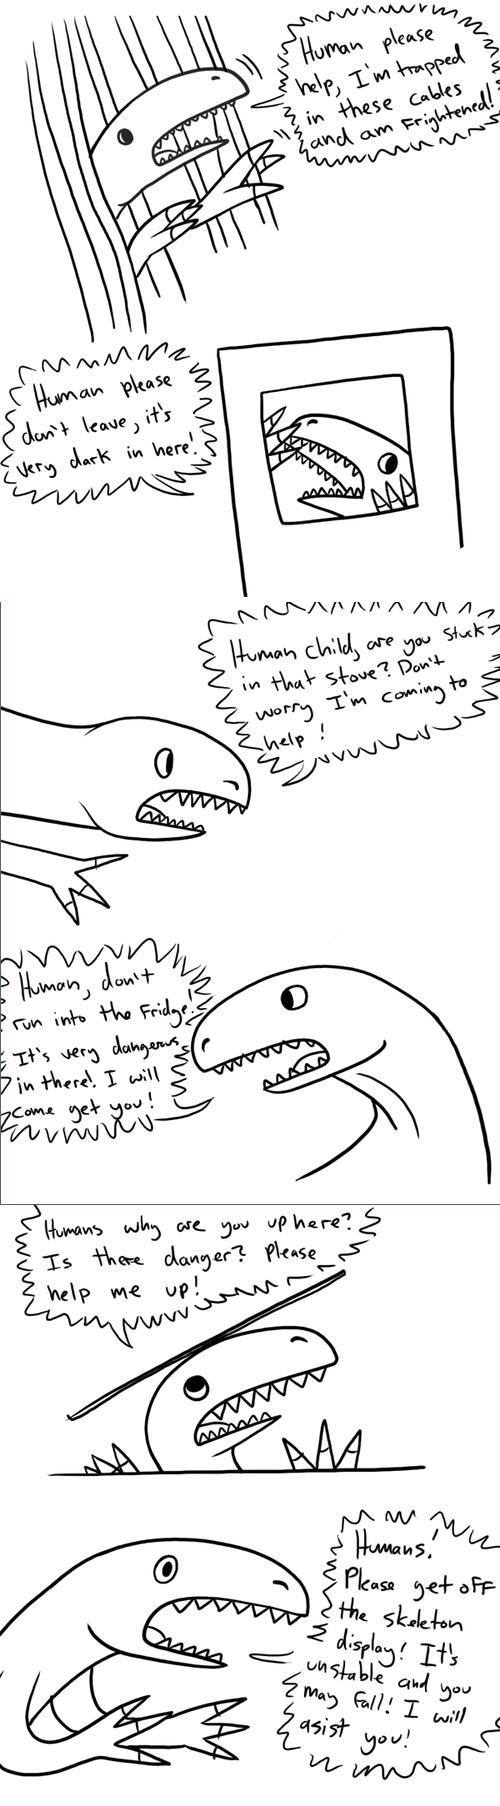 velociraptors jurassic park dinosaurs web comics - 8257380096